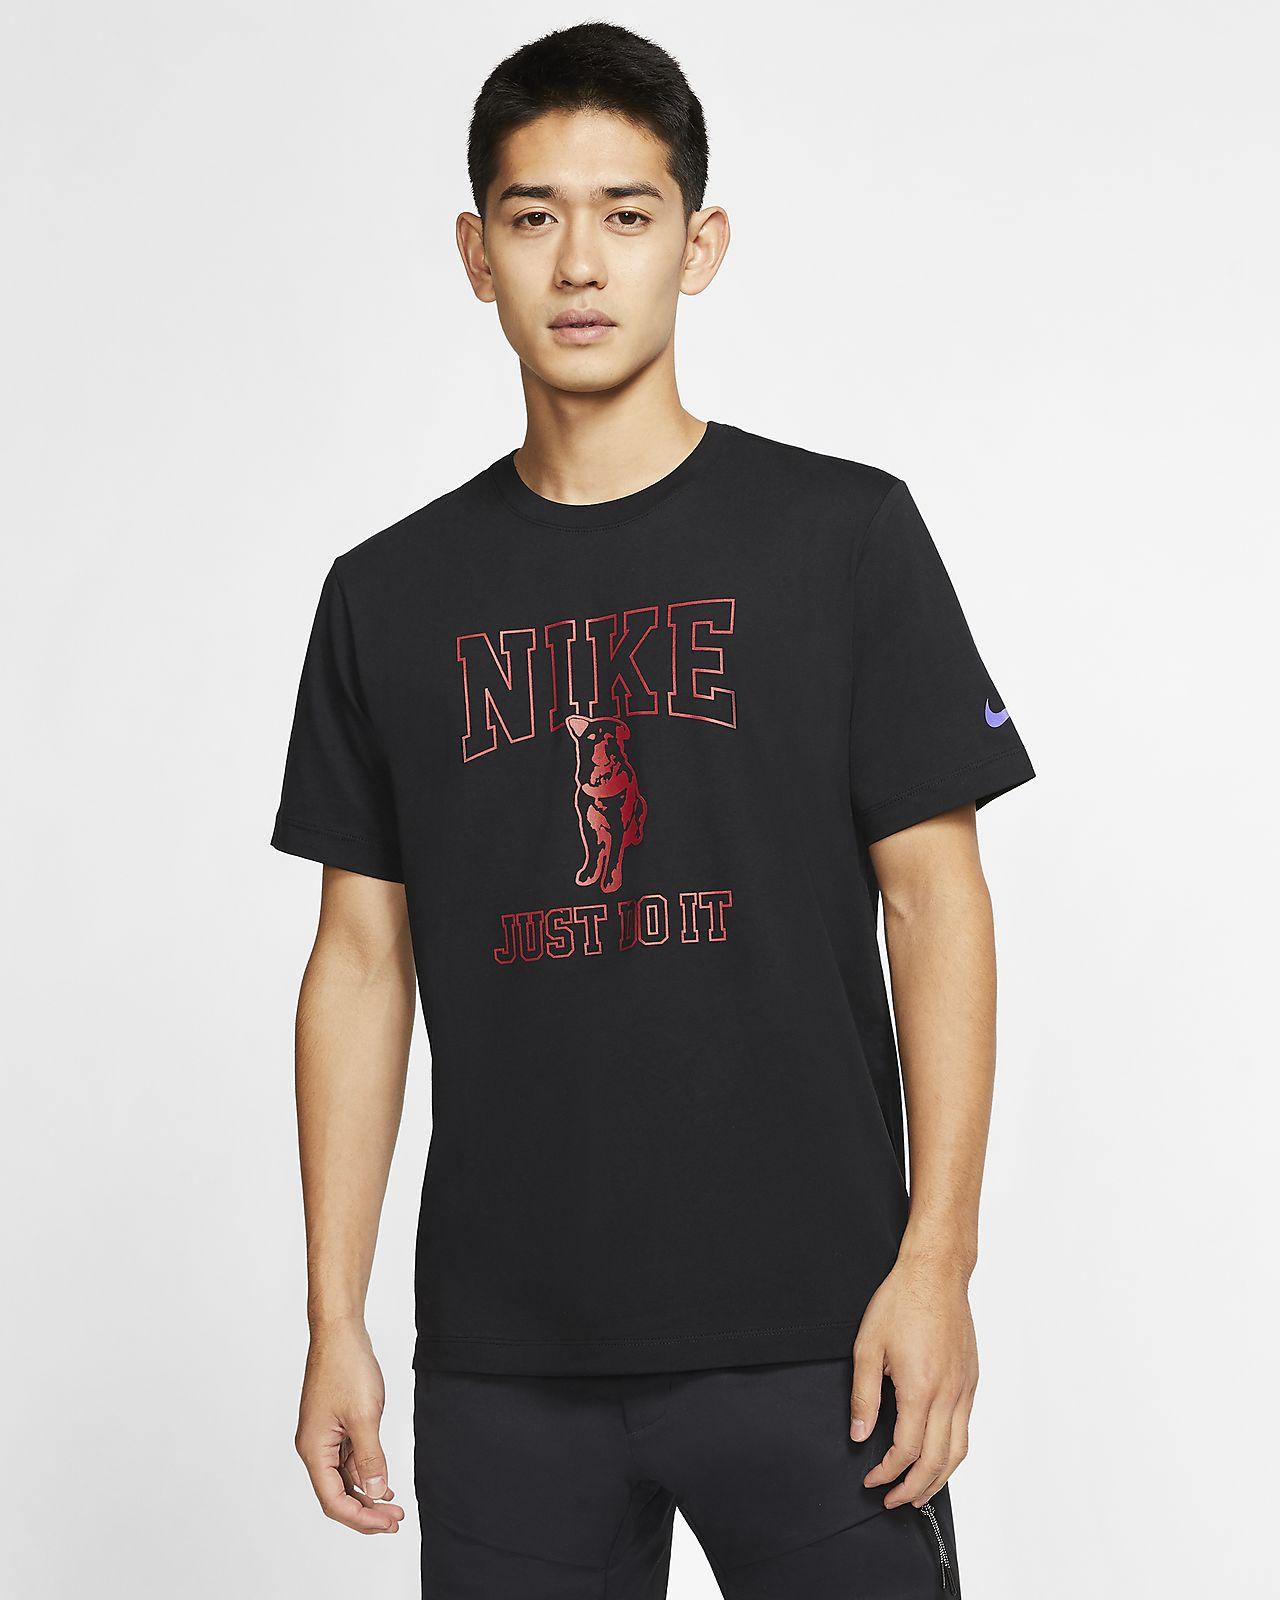 【Nike.com / Nike By Shibuya Scramble 限定】ナイキ メンズ Tシャツ